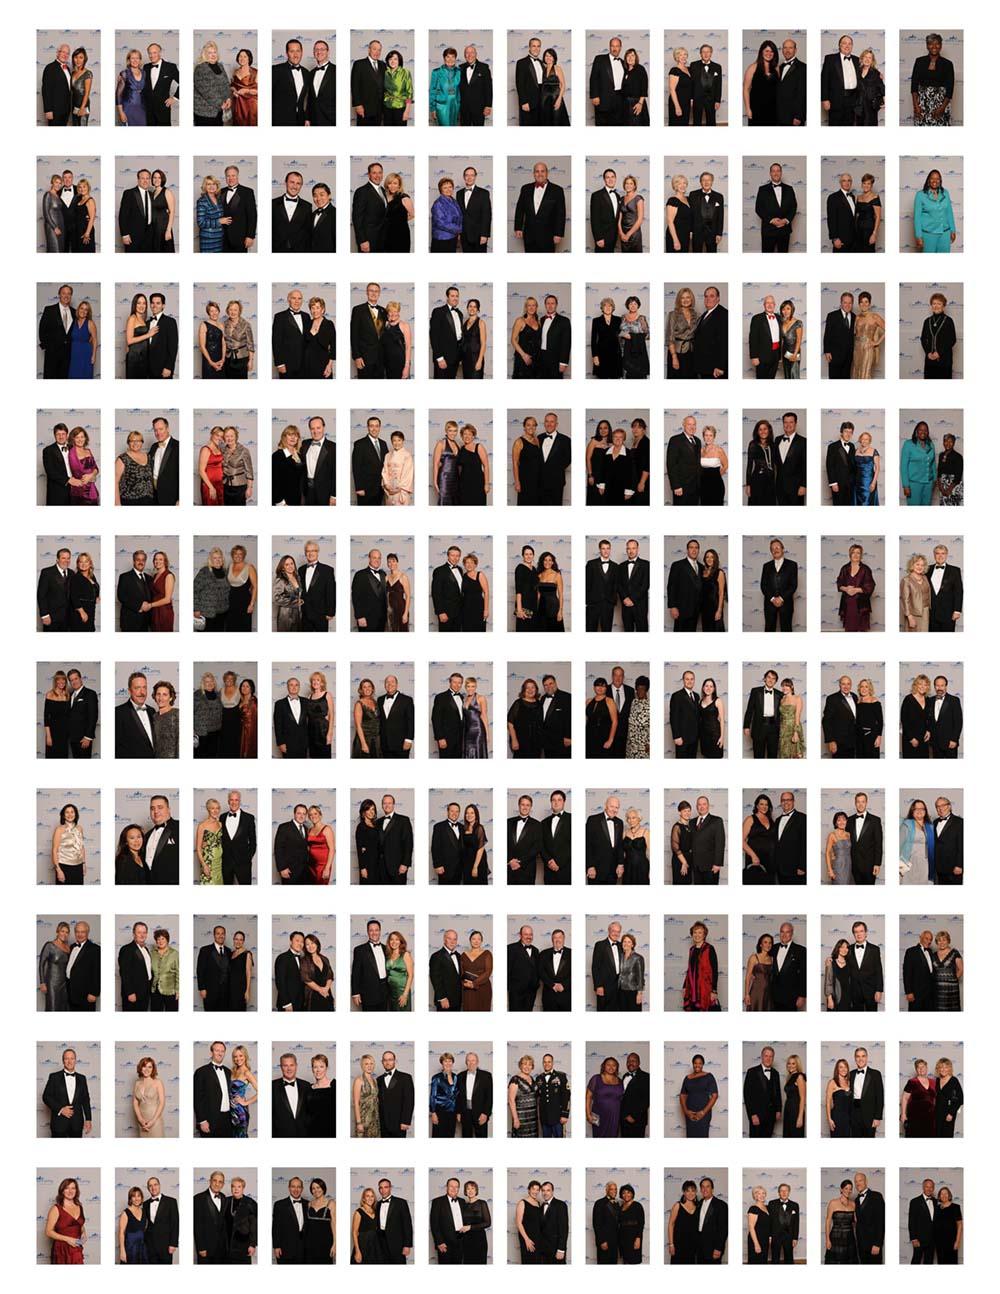 Event-Portraits-01-1.jpg